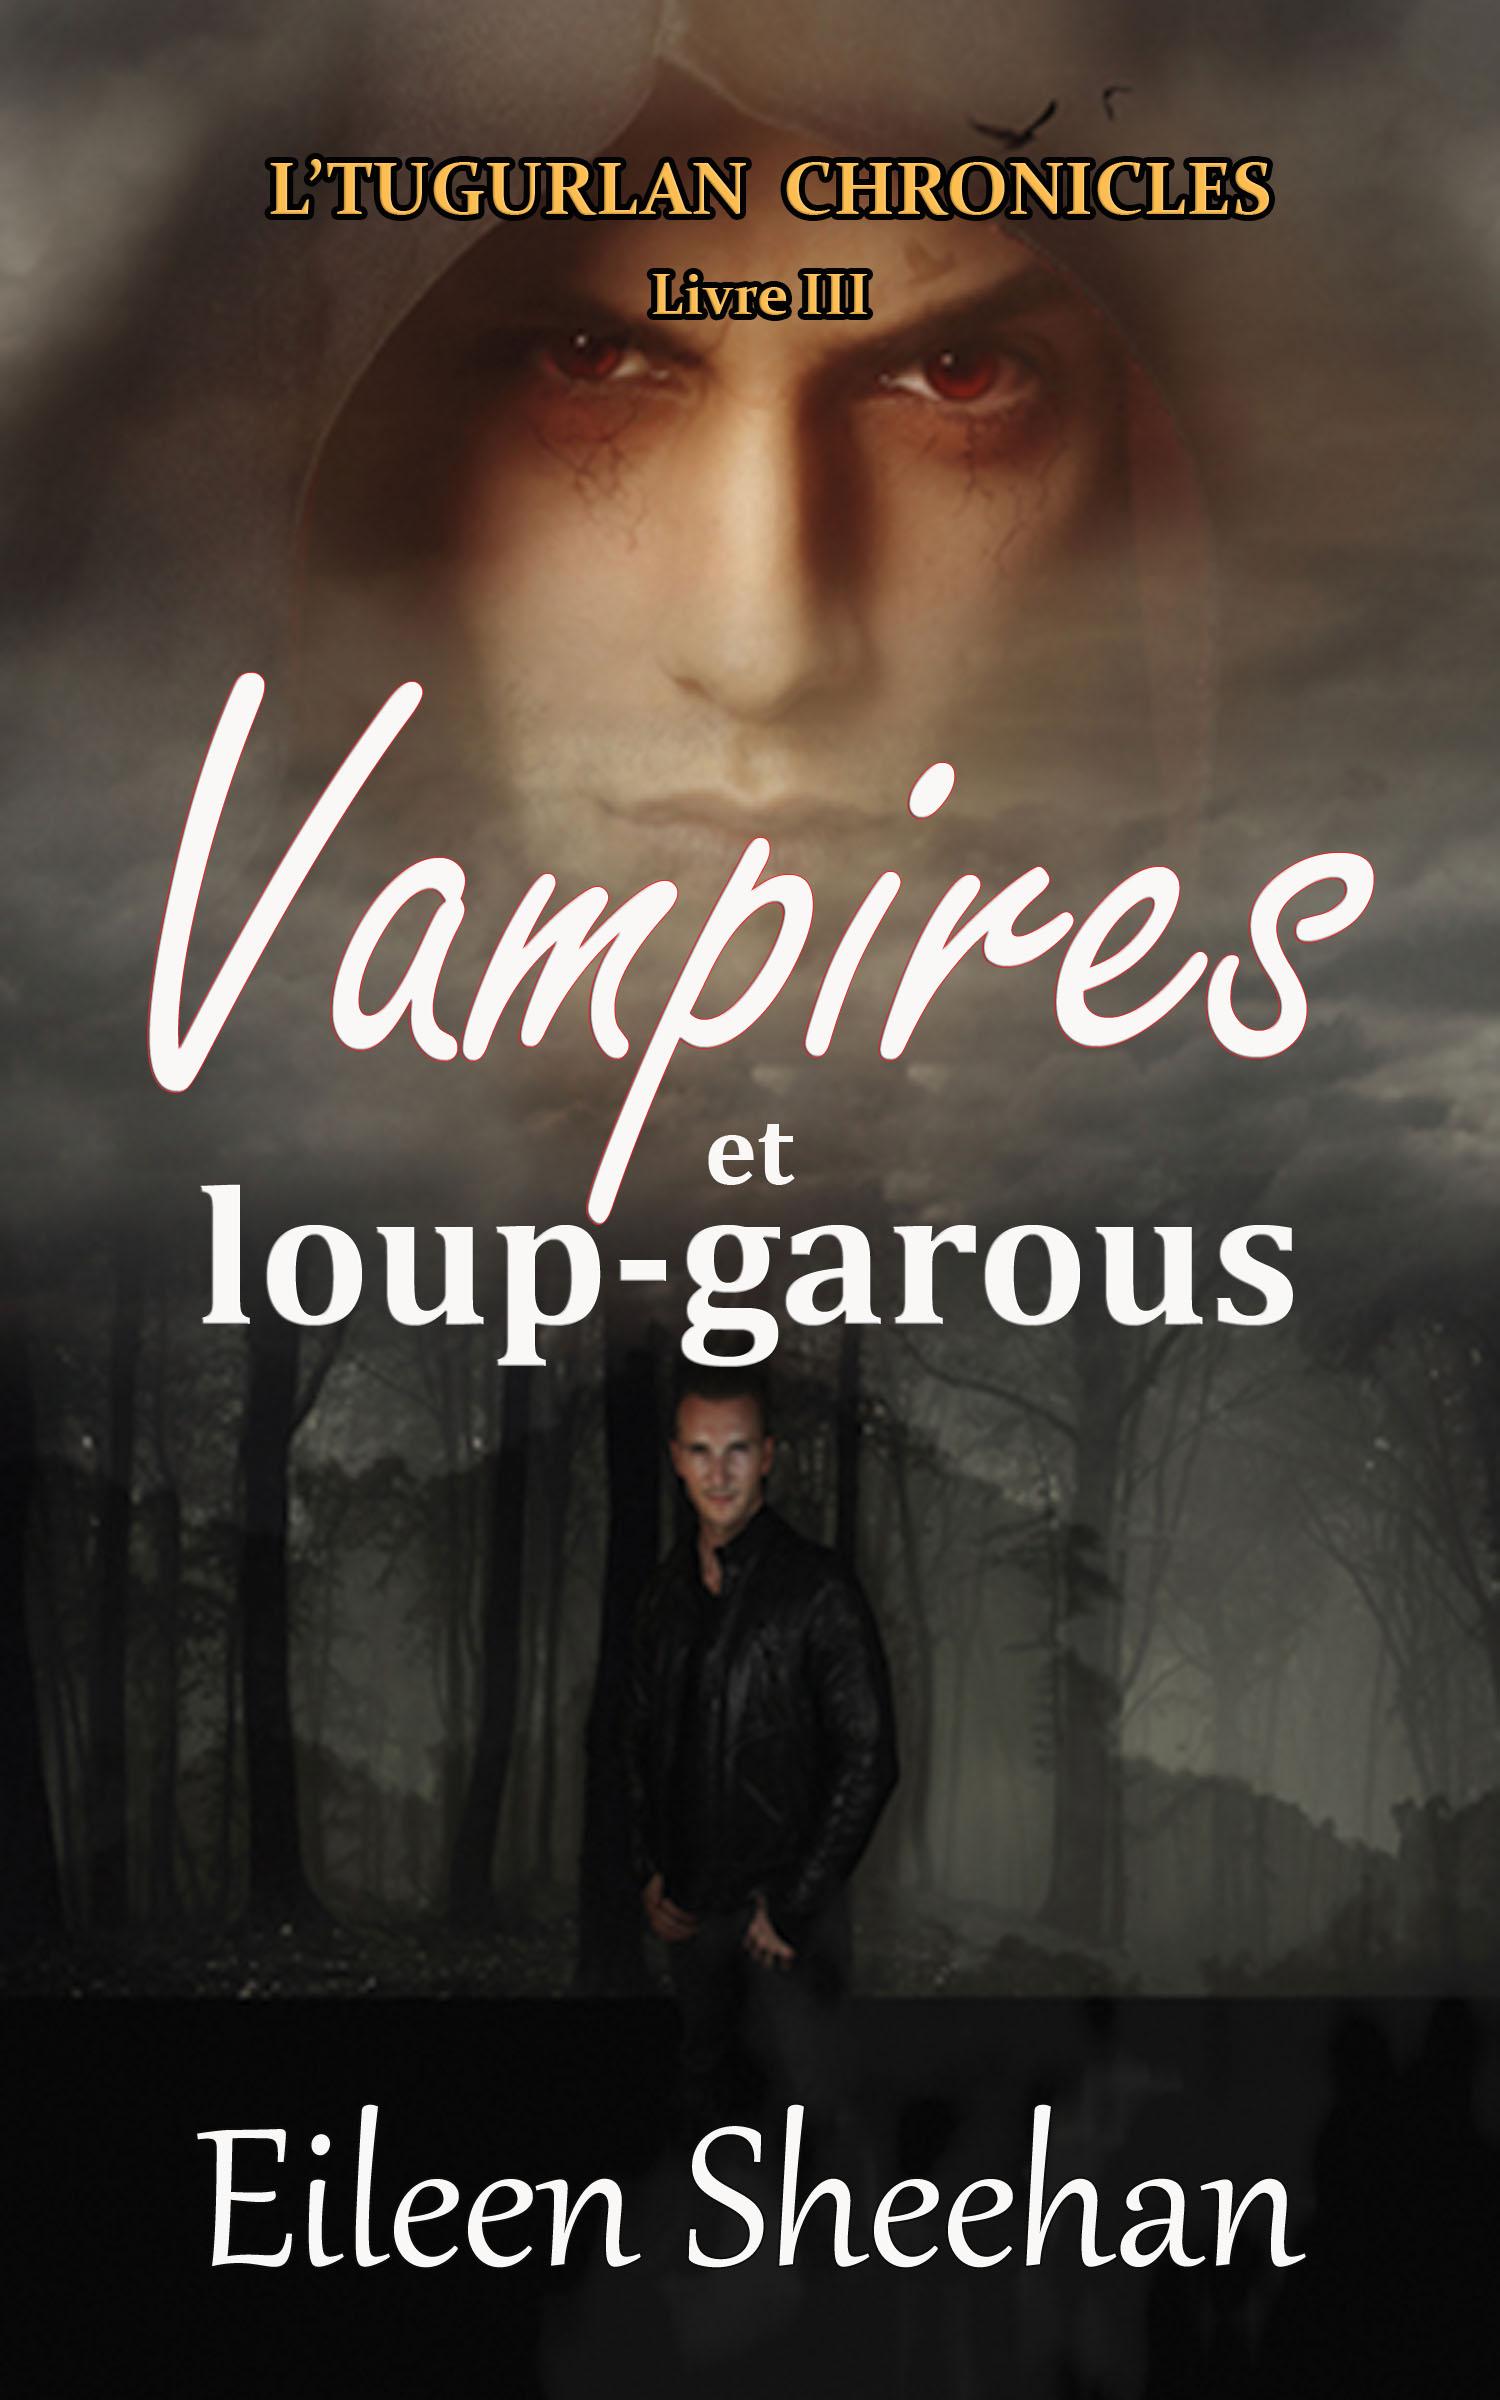 Vampires Et Loup Garous L Tugurlan Chronicles Livre 3 An Ebook By Eileen Sheehan